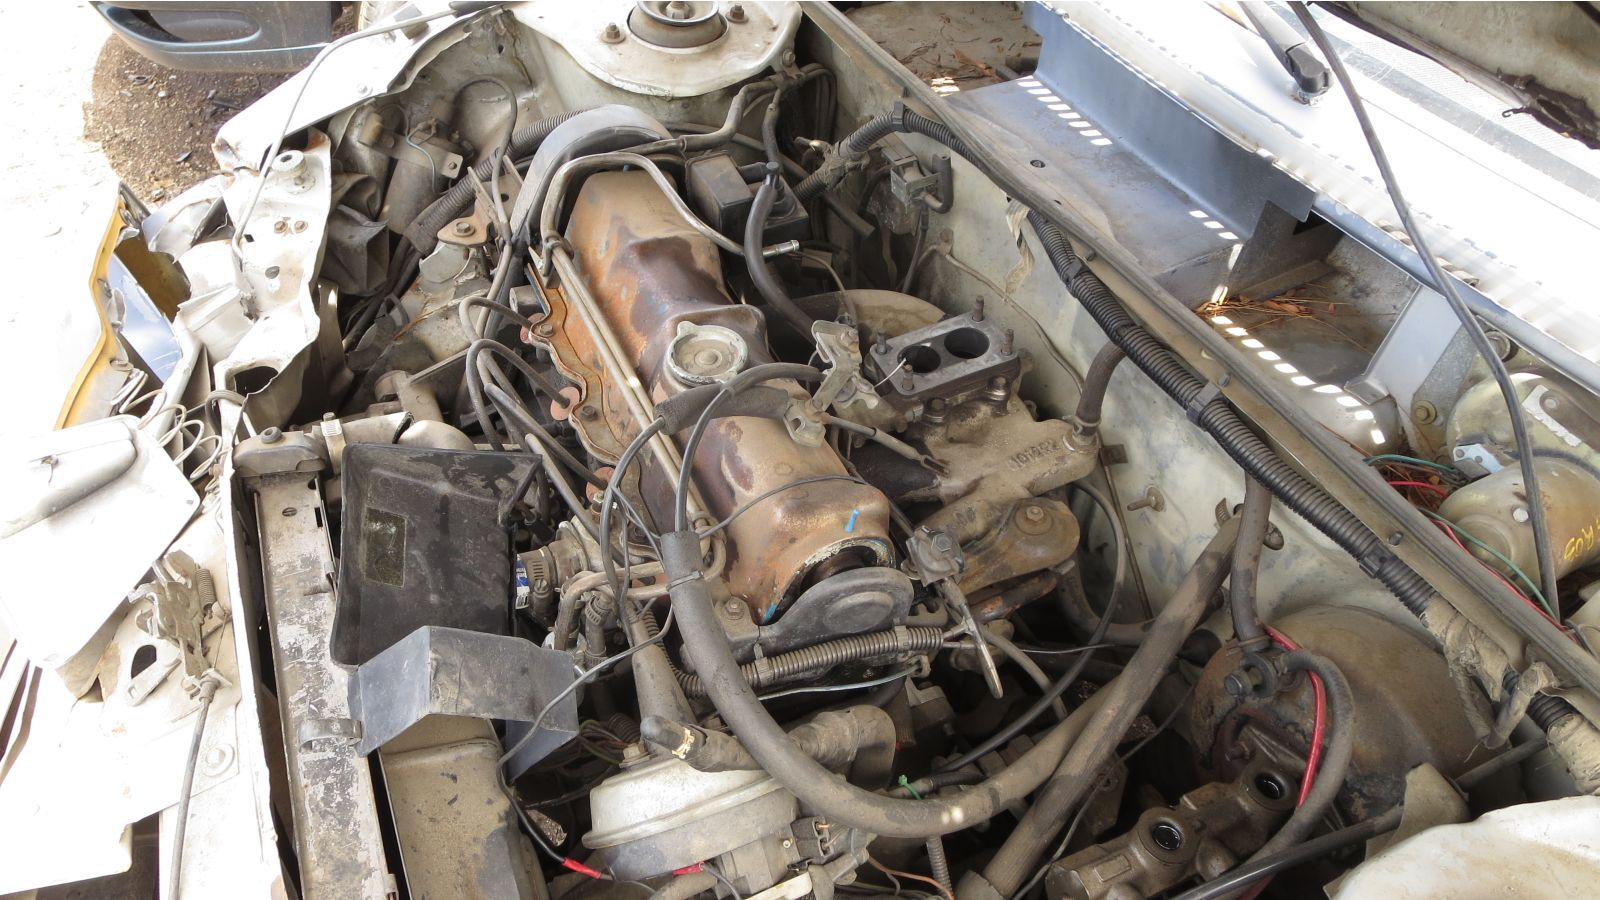 1983 Dodge Rampage in Denver wrecking yard